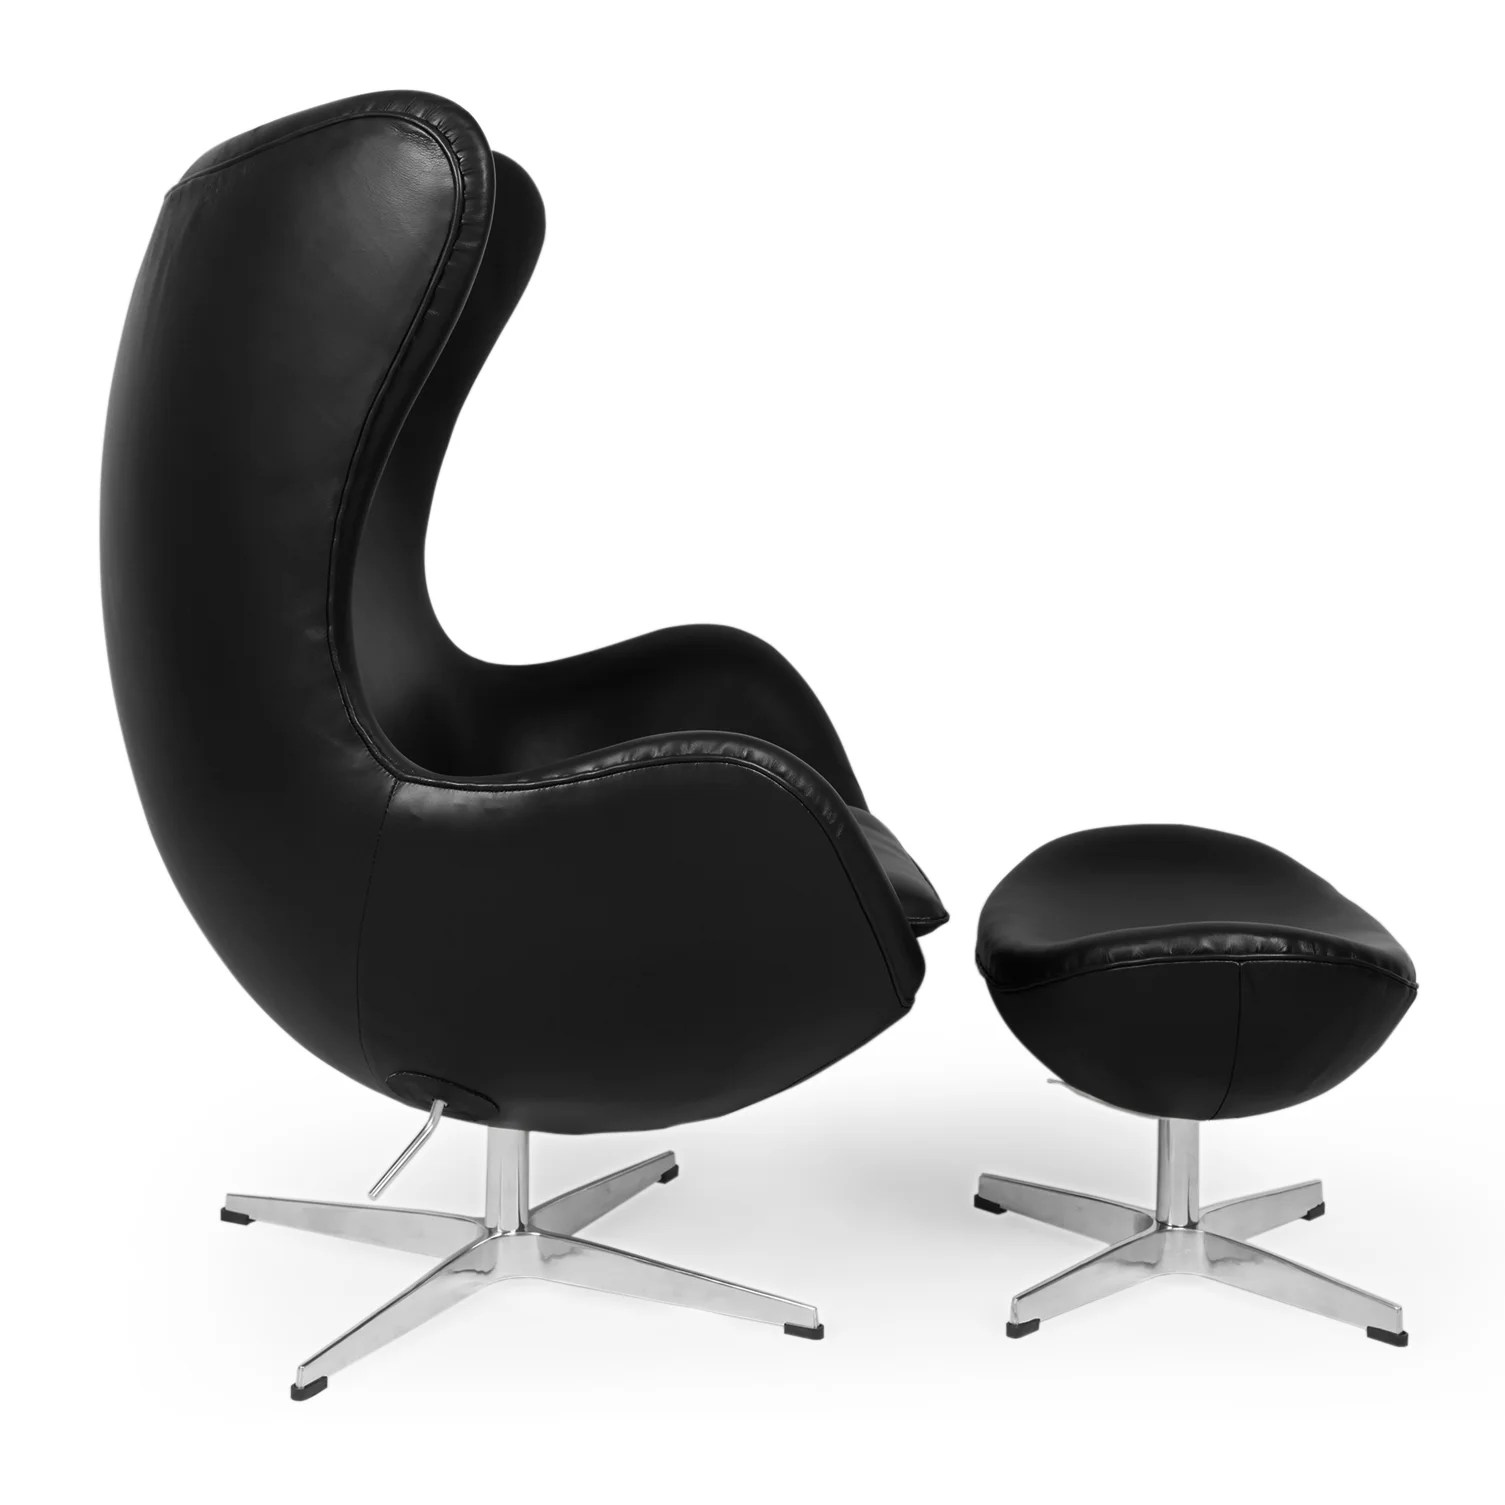 chair with balloons x rocker gaming chairs kardiel amoeba balloon and ottoman wayfair